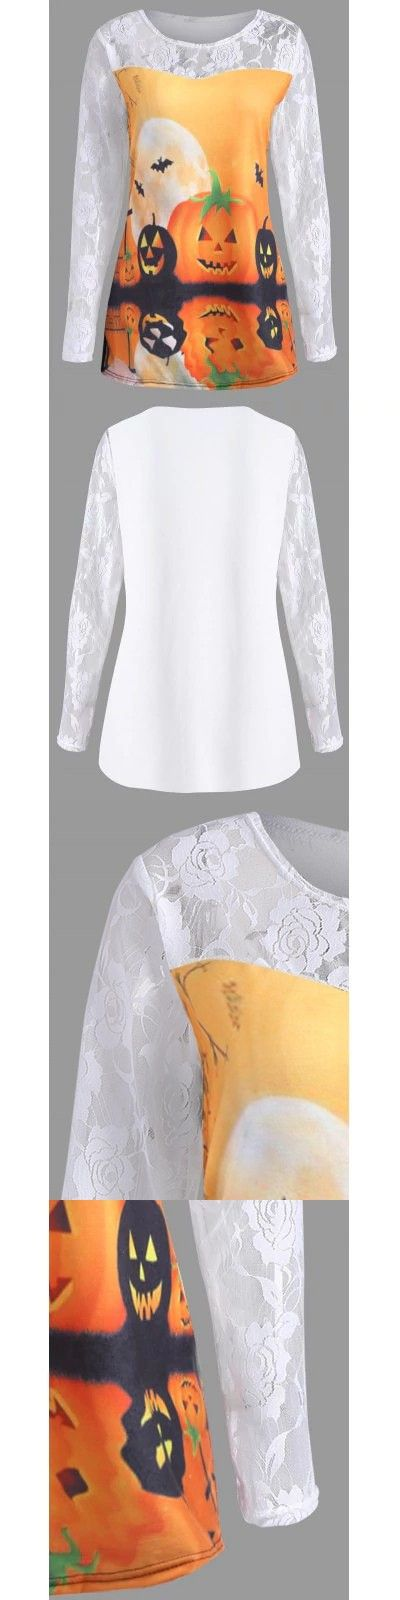 White and orange Plus Size Halloween Pumpkin Moon Lace Insert T-Shirt 5XL-$20.12